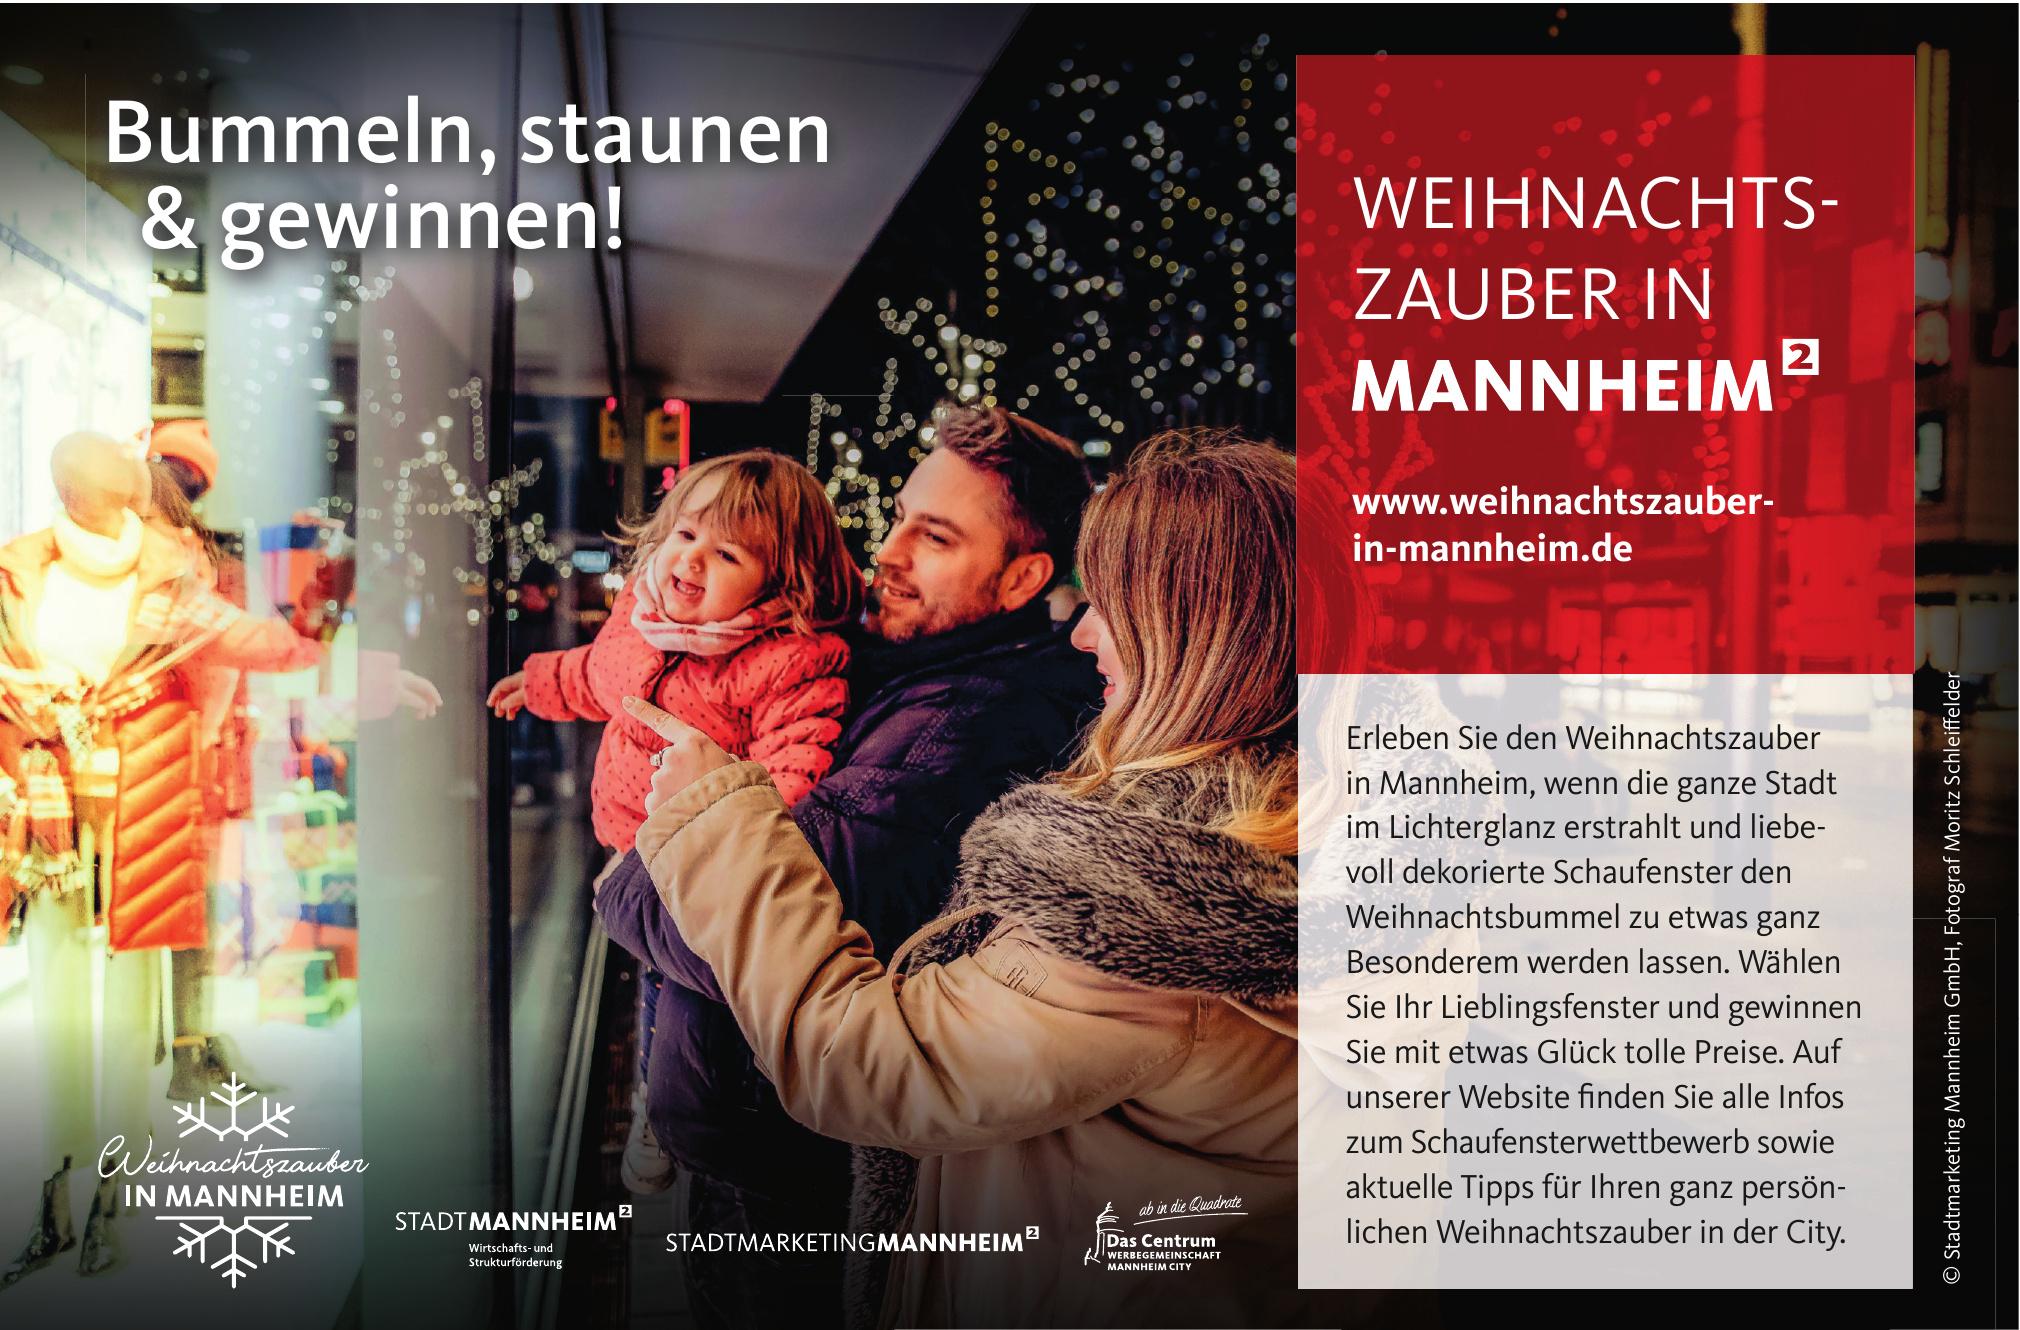 Stadtmarketing Mannheim GmbH